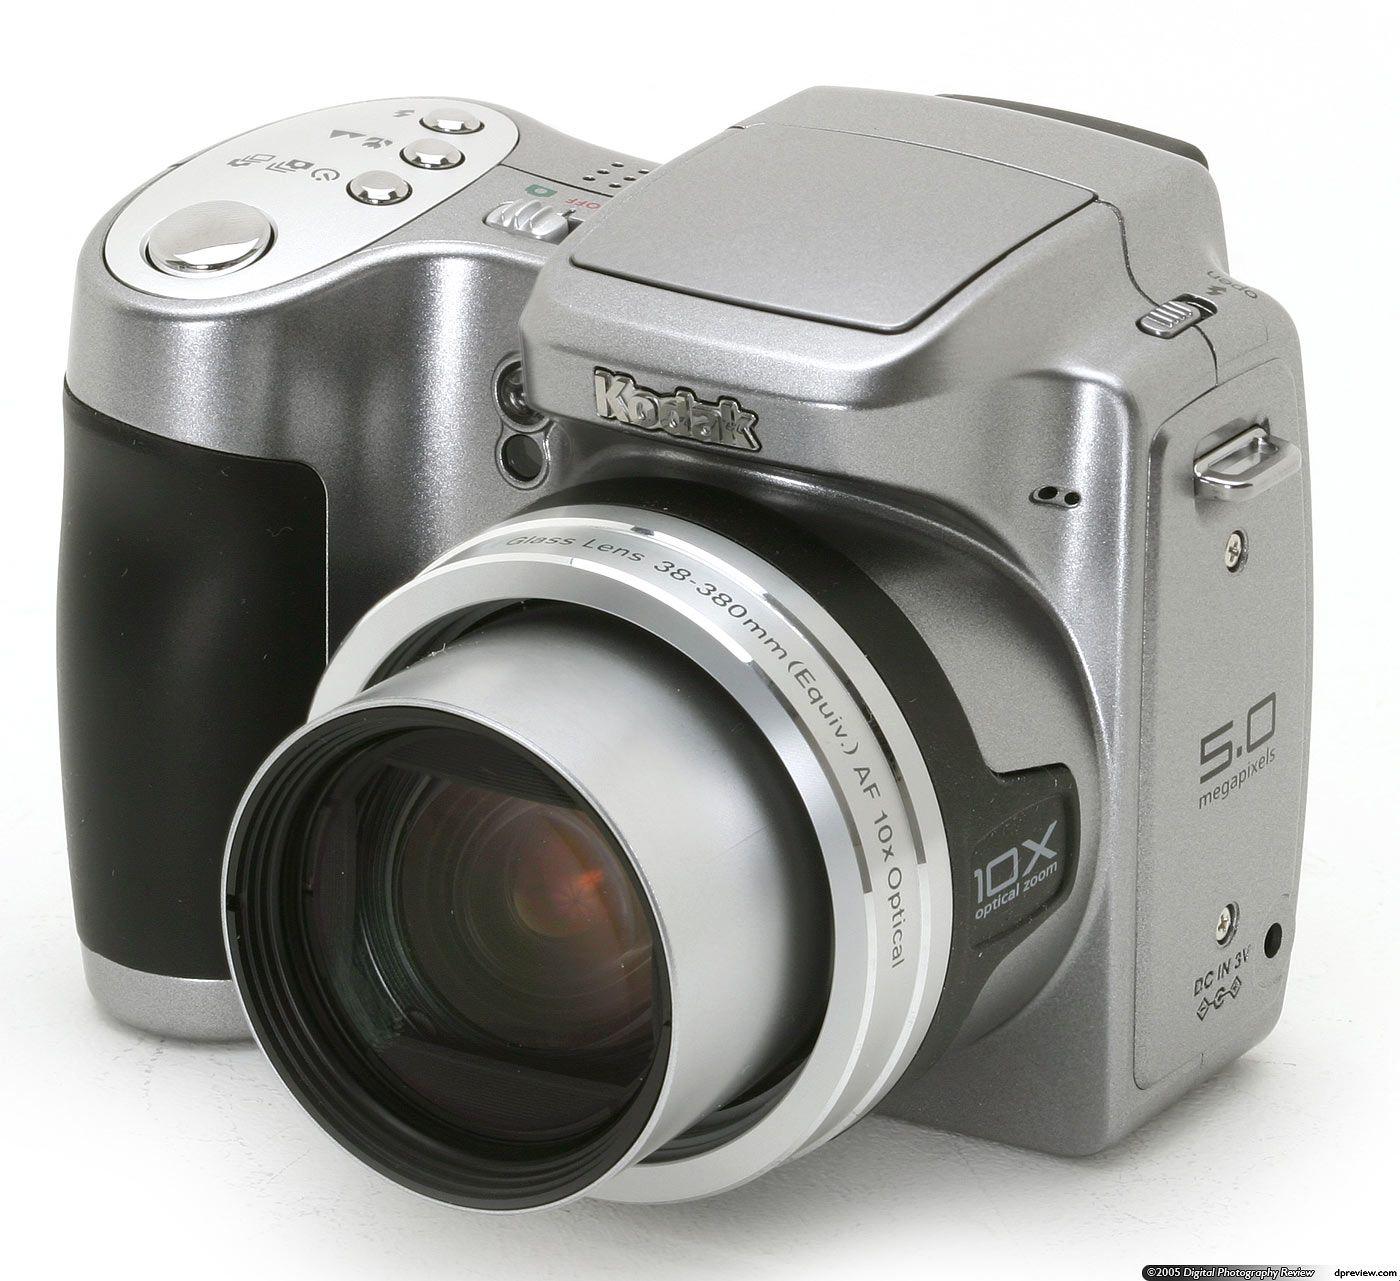 Kodak Easyshare Software 8 3 Full Version Free Download Kodak Easyshare Kodak Fujifilm Instax Mini